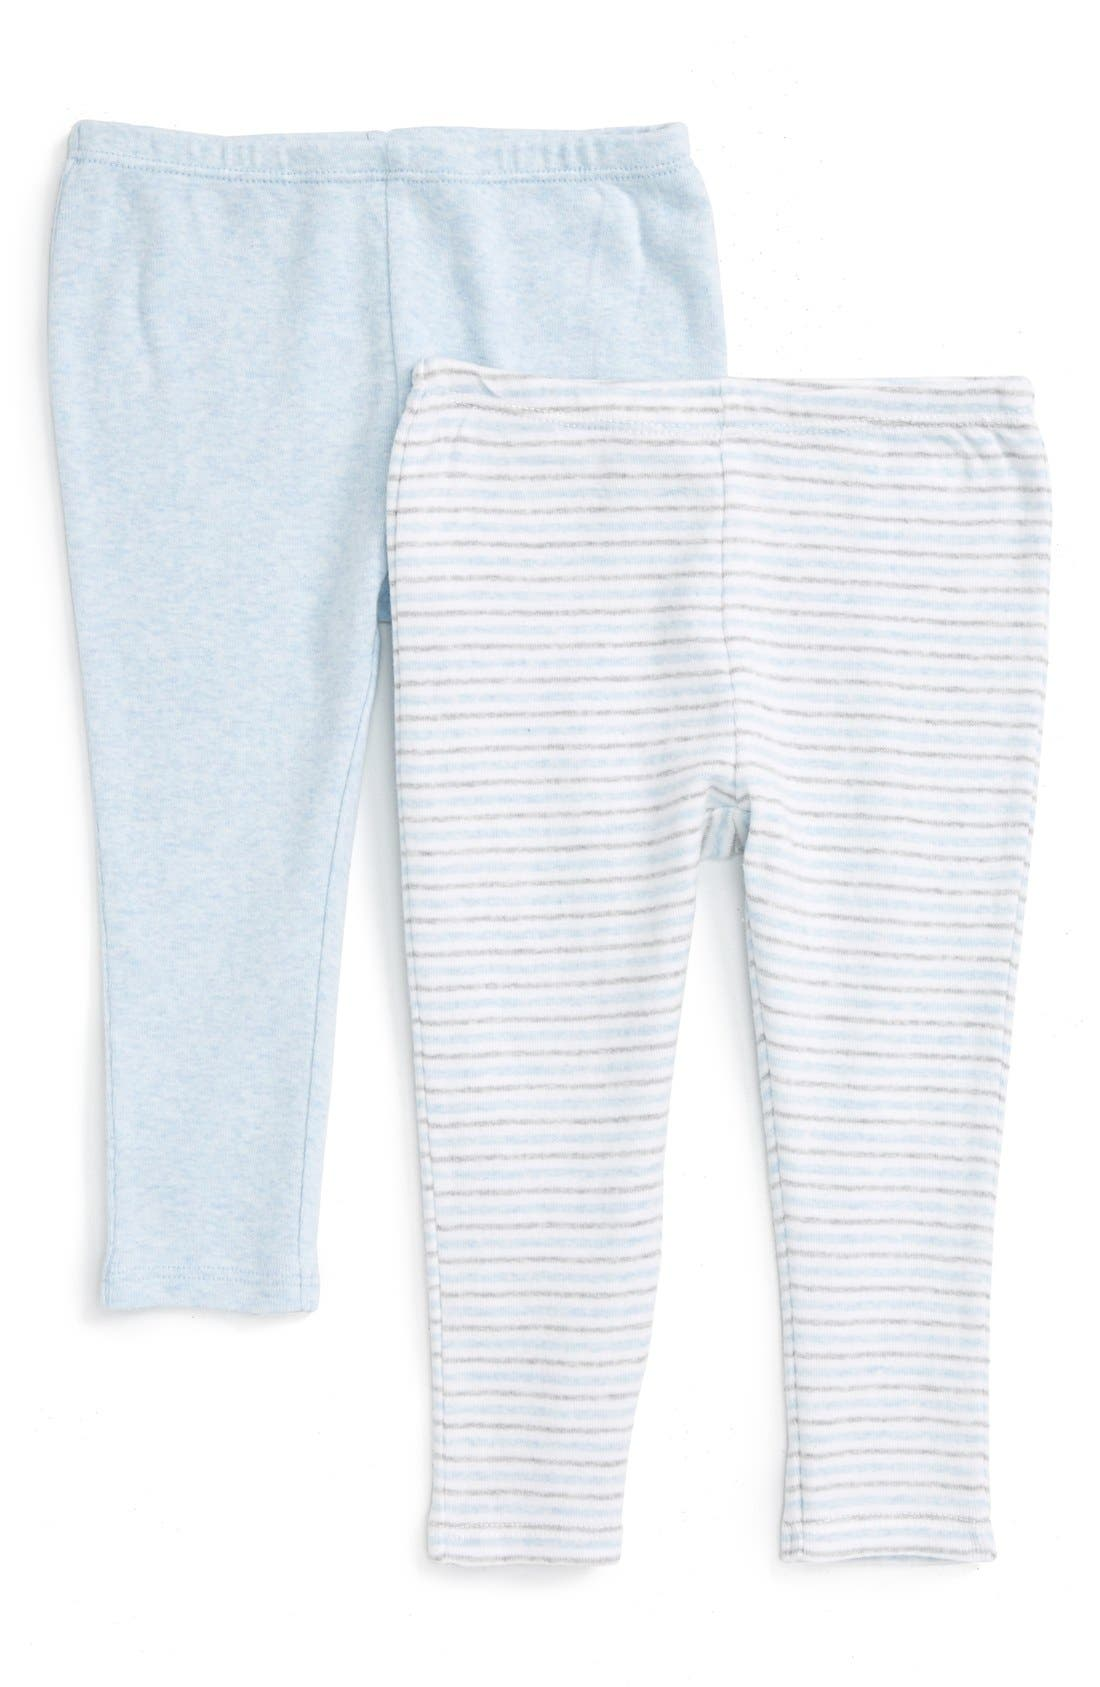 2-Pack Leggings, Main, color, BLUE PRECIOUS HEATHER PACK